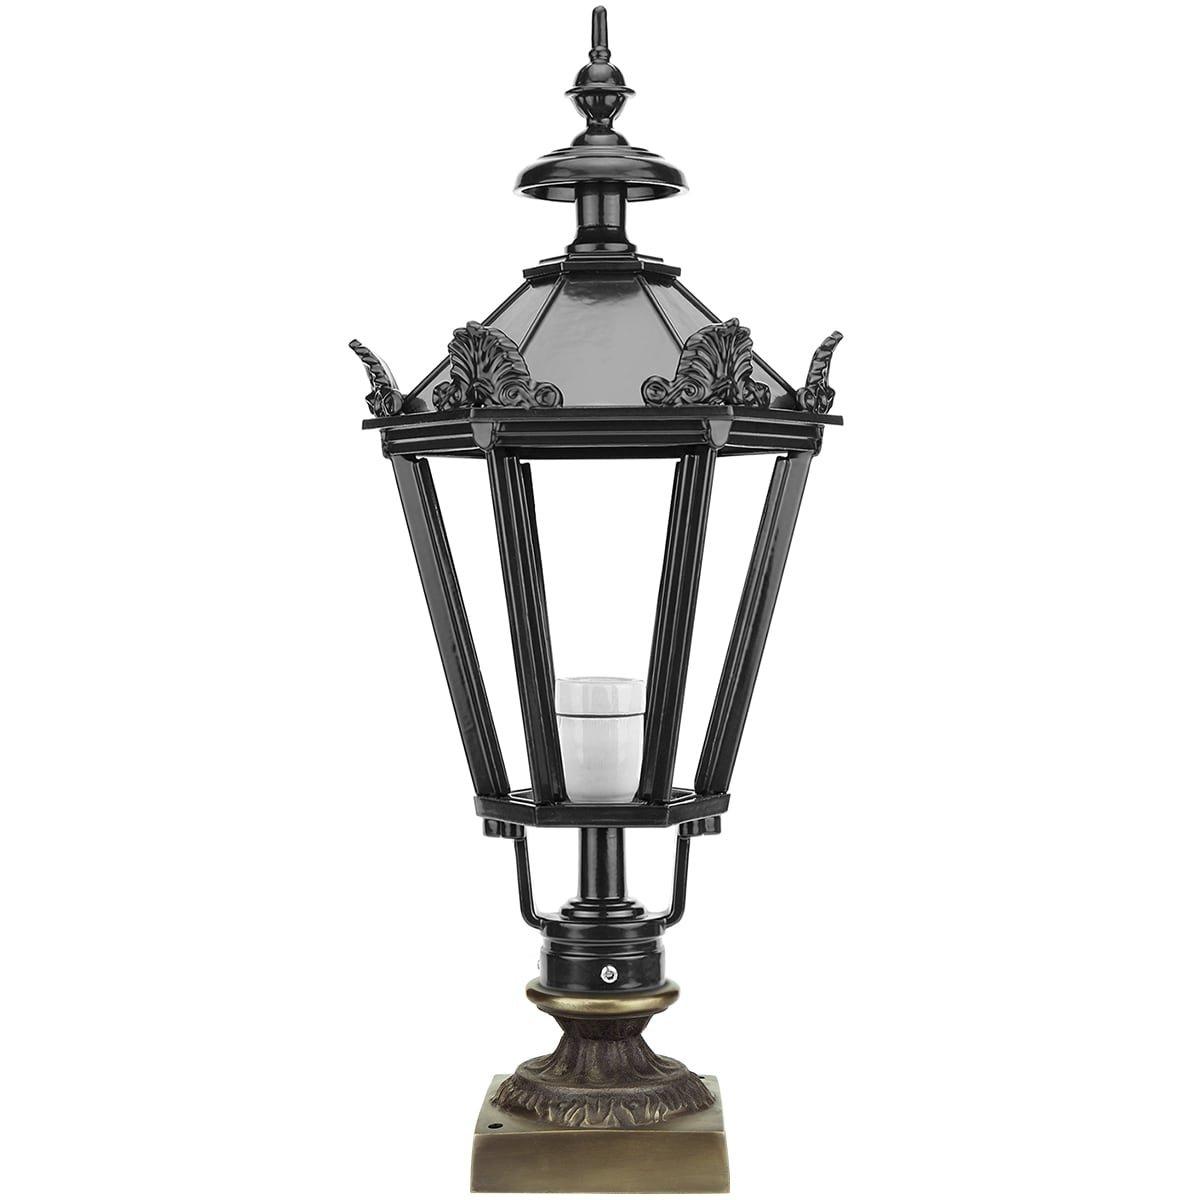 Outdoor Lighting Classic Nostalgic Lantern outdoor lamp Agelo bronze - 73 cm